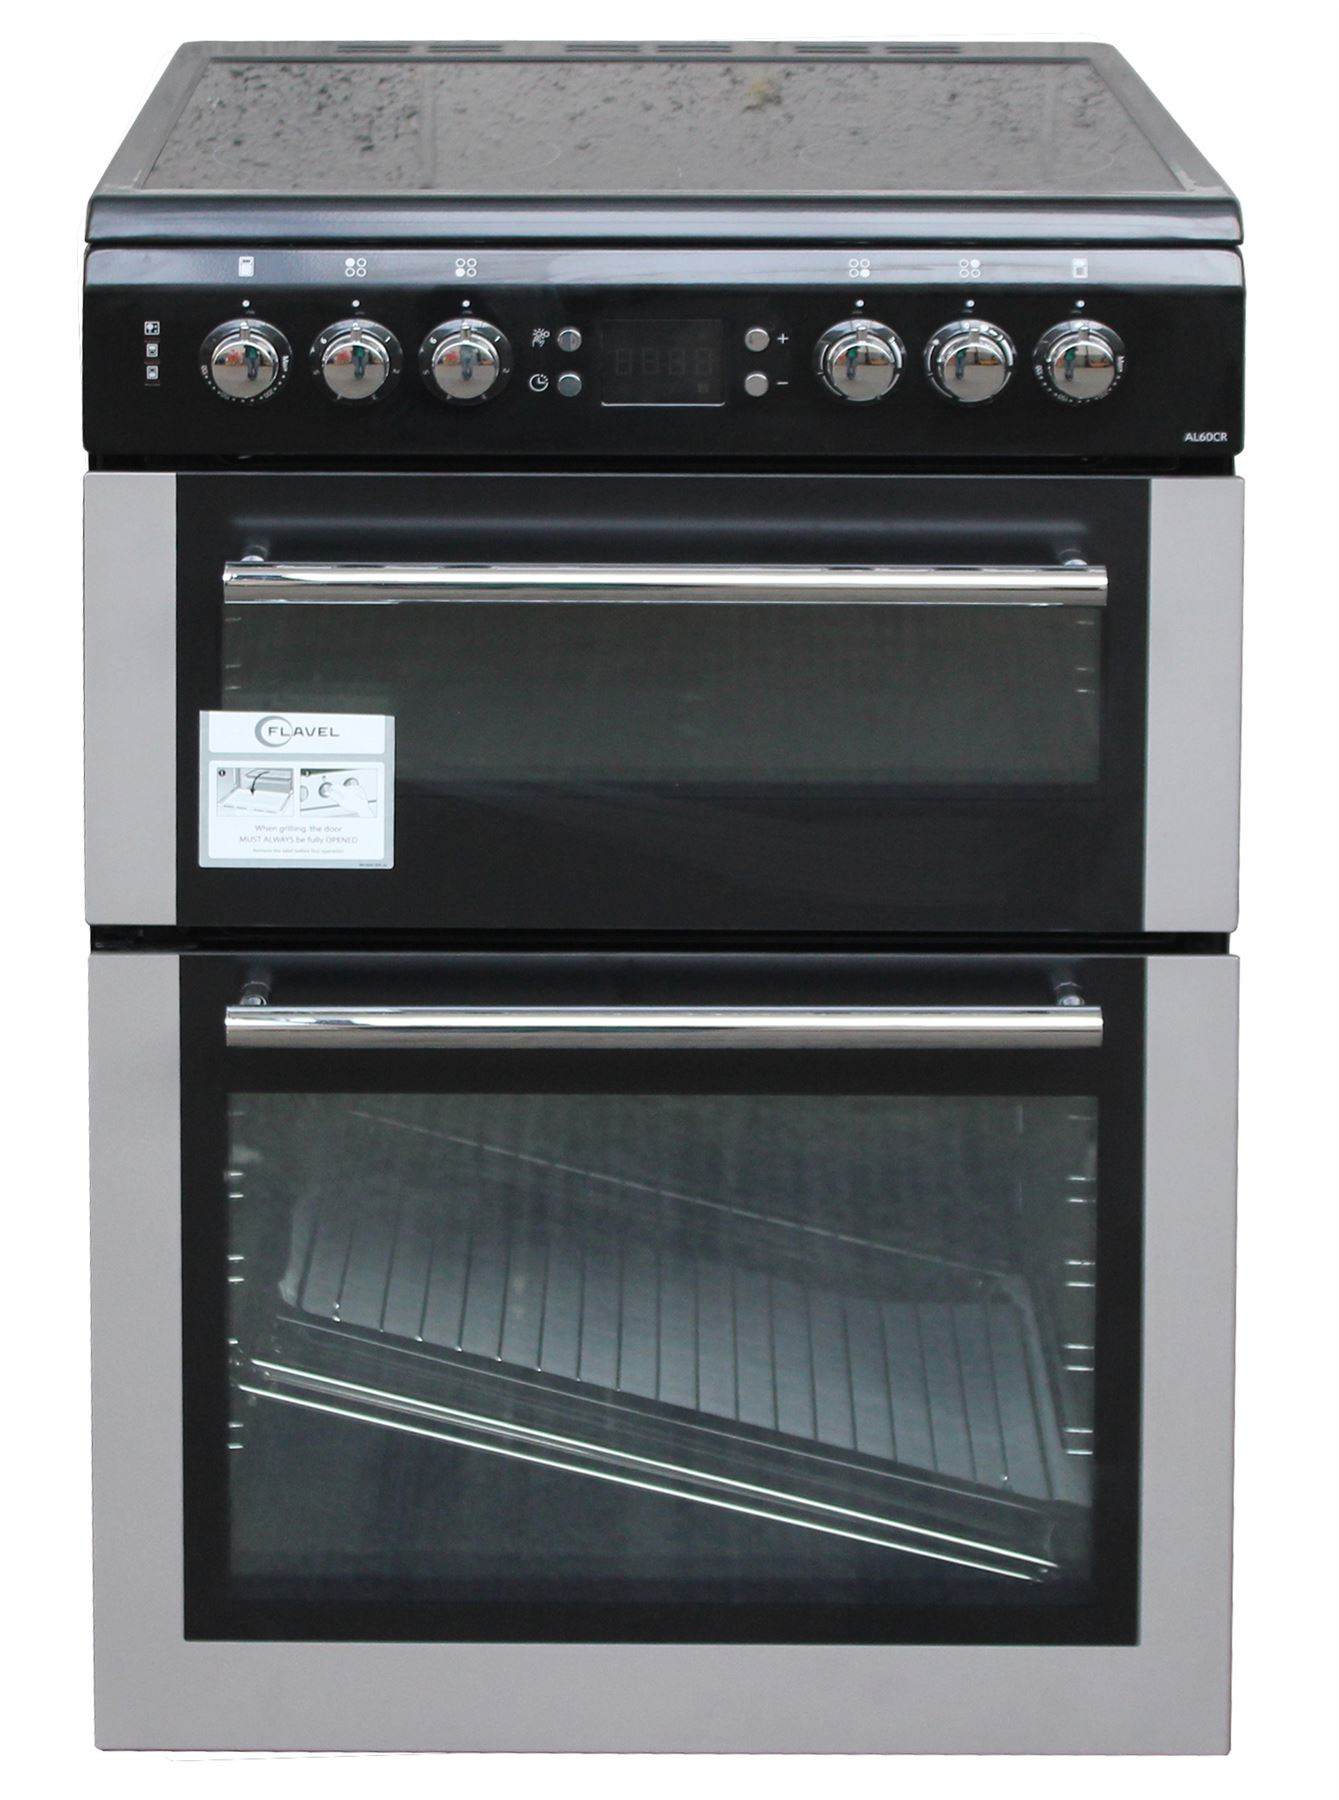 Leisure 60cm Electric Cooker Al60crk Mini Range Double